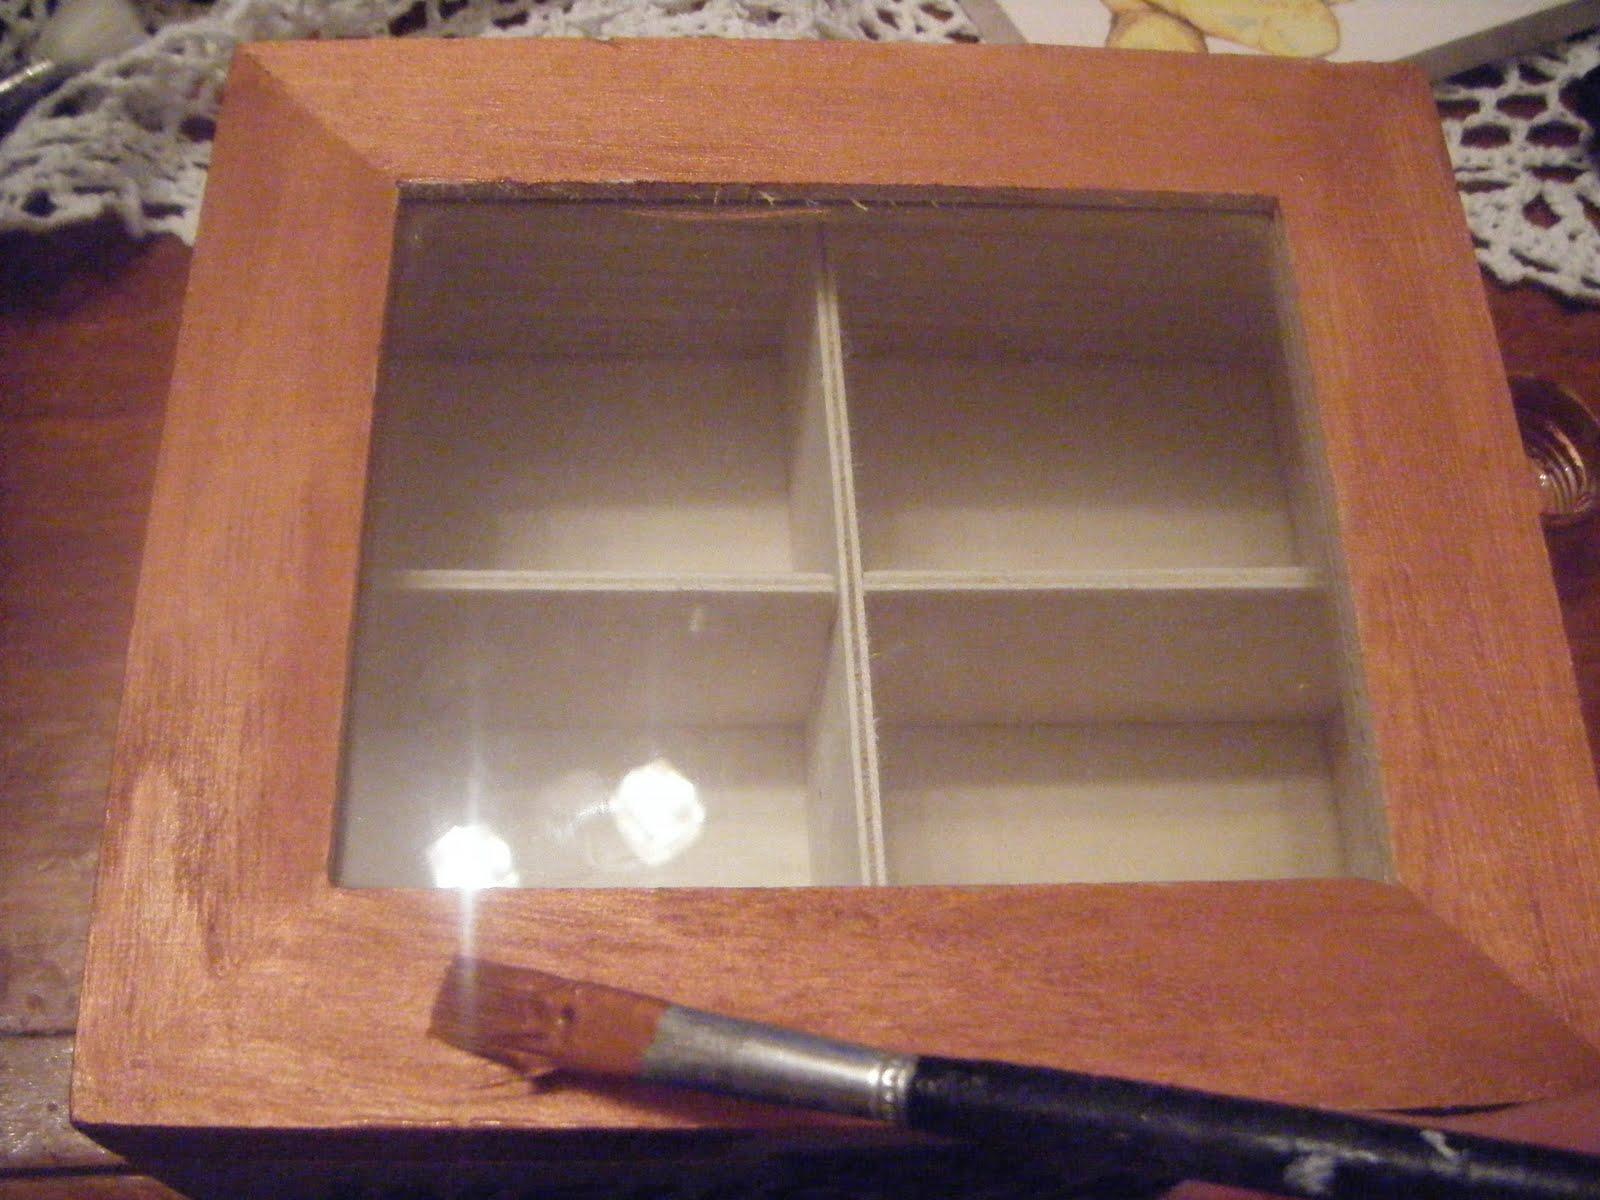 Manualidades de mari caja de madera para infusiones - Manualidades caja de madera ...